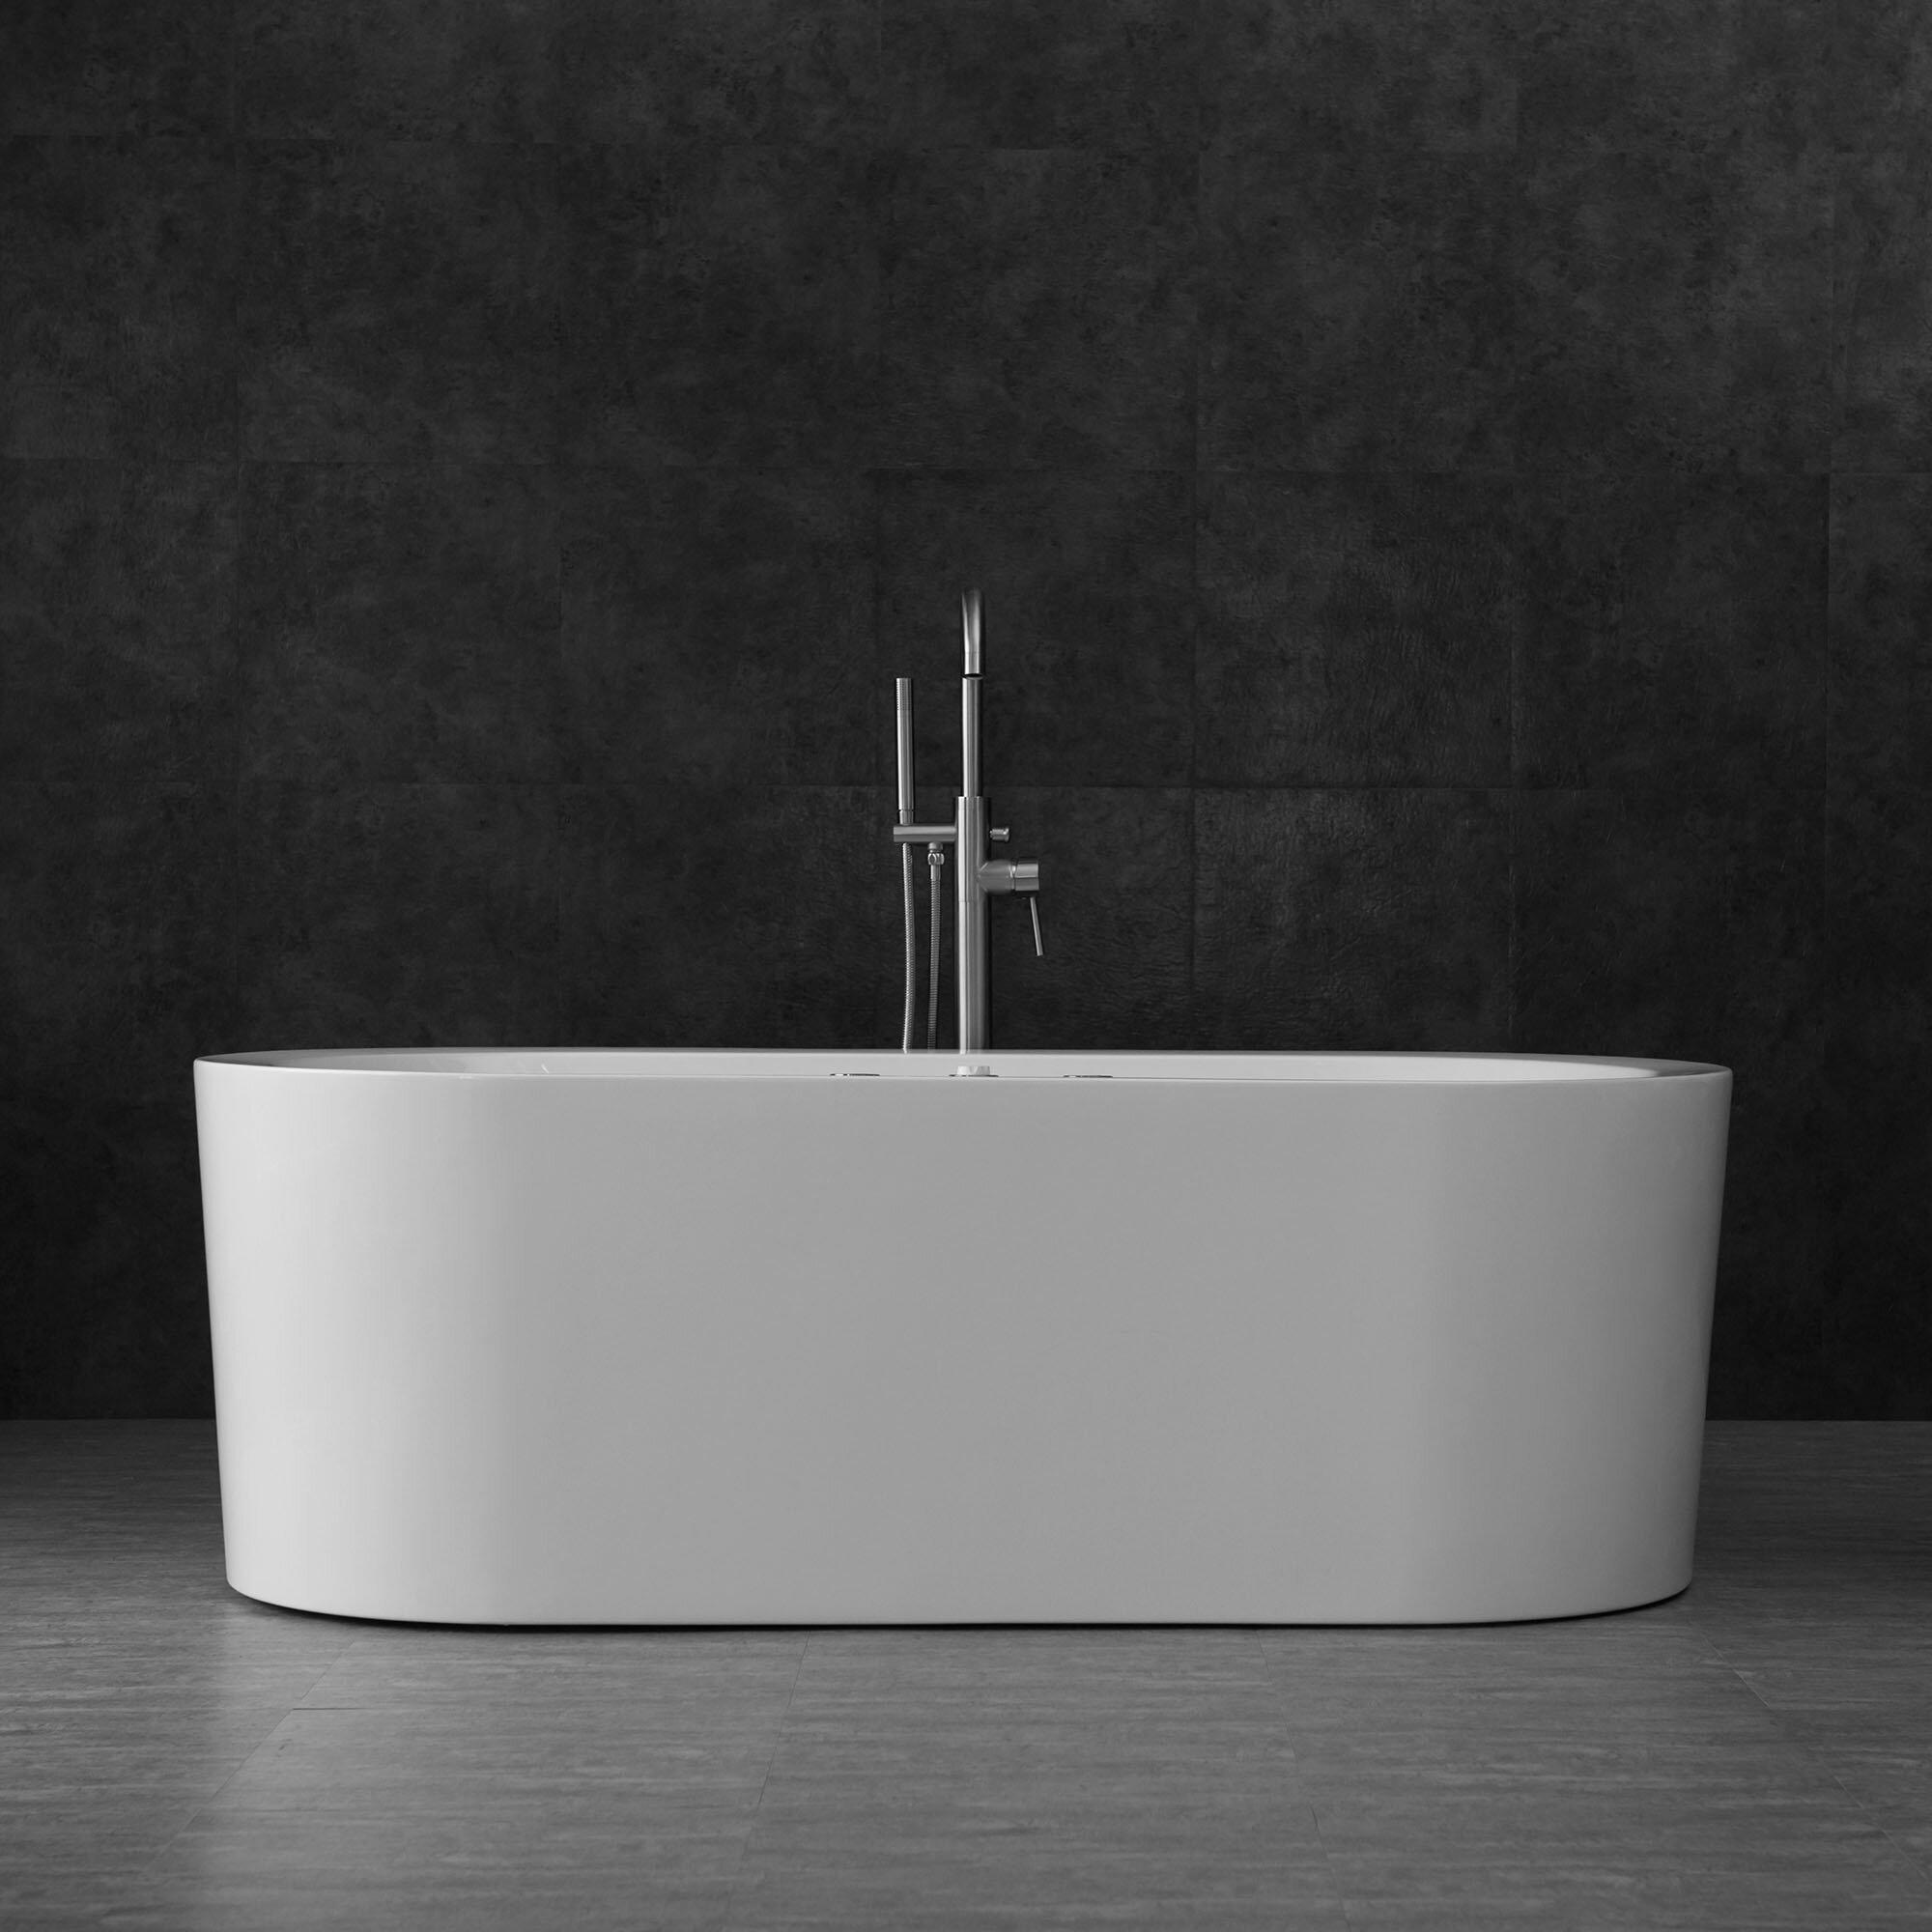 Woodbridge F-0002 Deluxe Freestanding Faucet Chrome